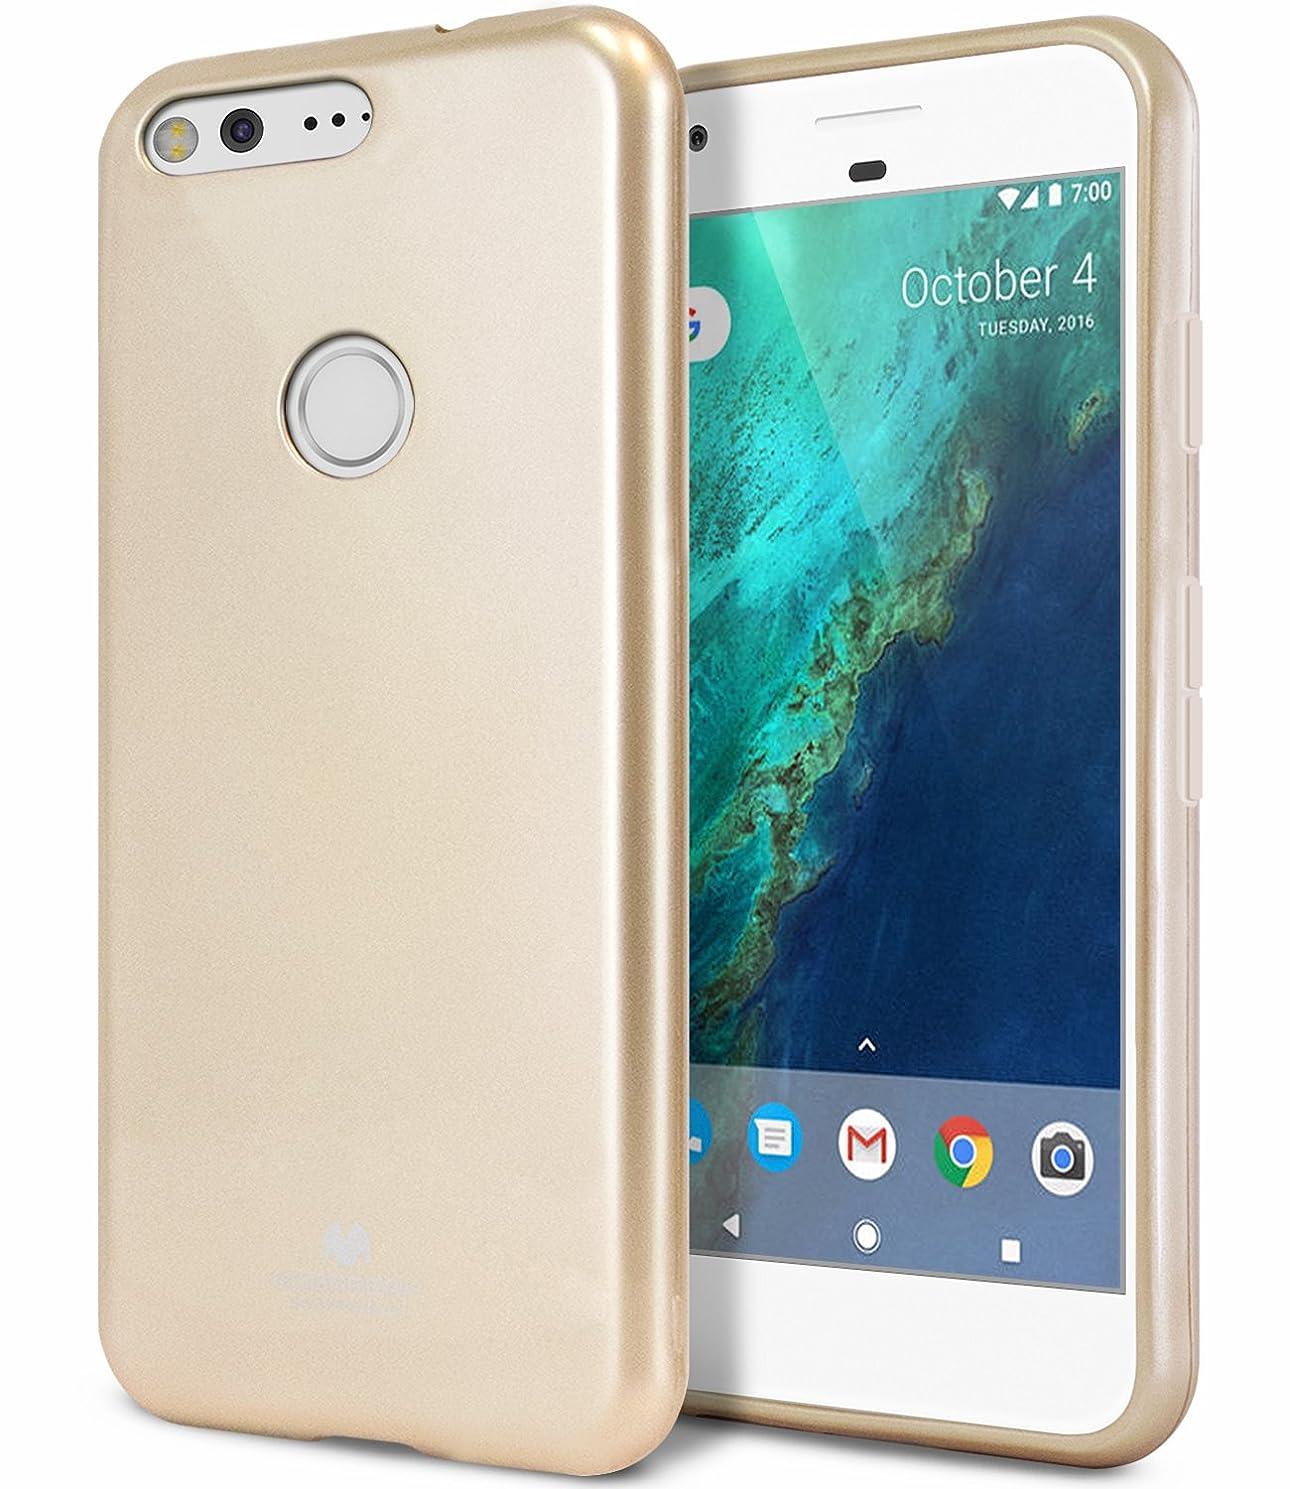 Google Pixel XL Case, [Thin Slim] GOOSPERY [Flexible] Color Pearl Jelly Rubber TPU Case [Lightweight] Bumper Cover [Impact Resistant] for Google Pixel XL 2016 (Gold) PIXXL-JEL-GLD